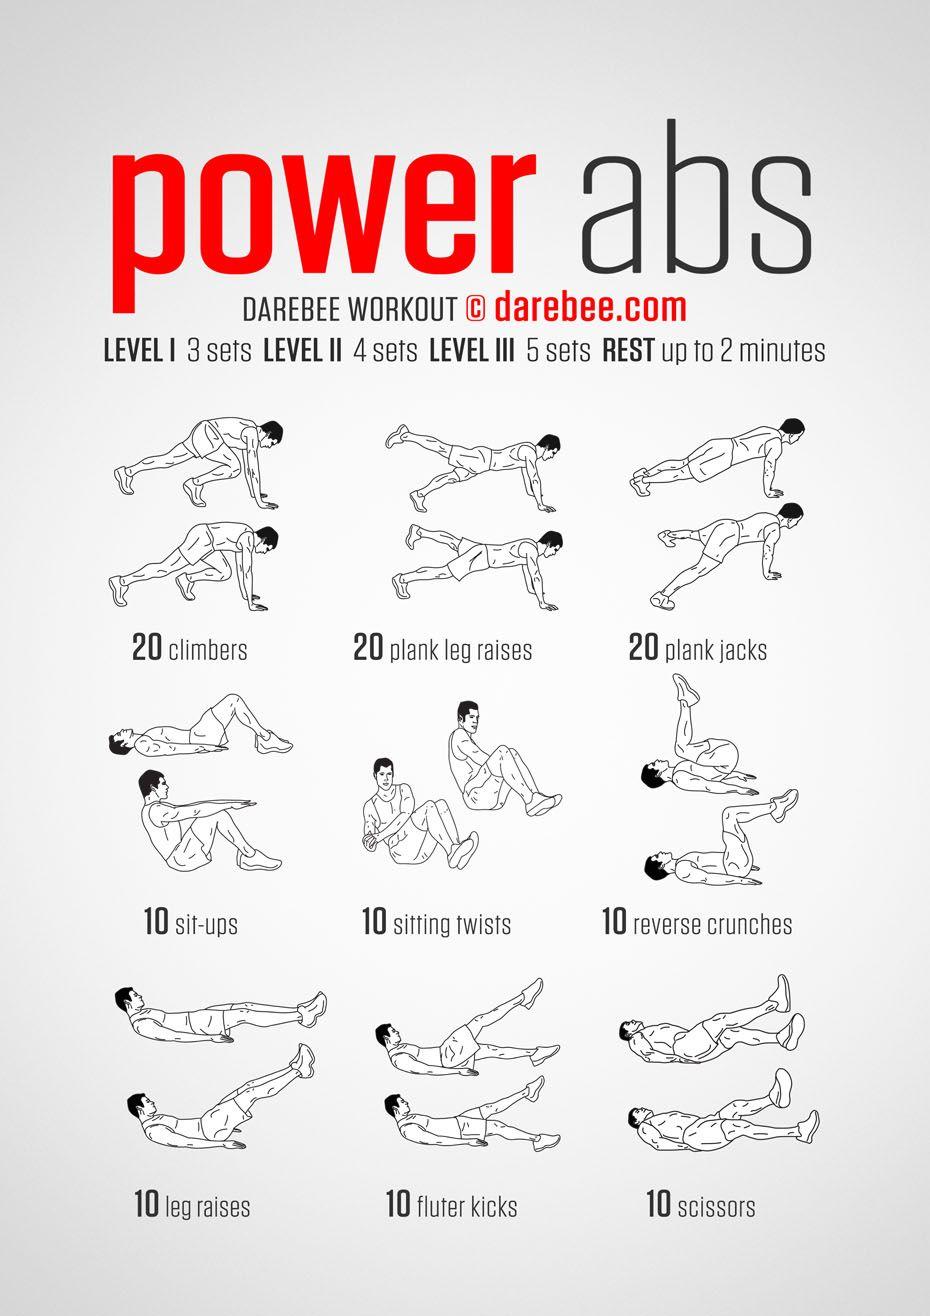 Power Abs - Darebee Workout | Ab Workouts | Pinterest ...